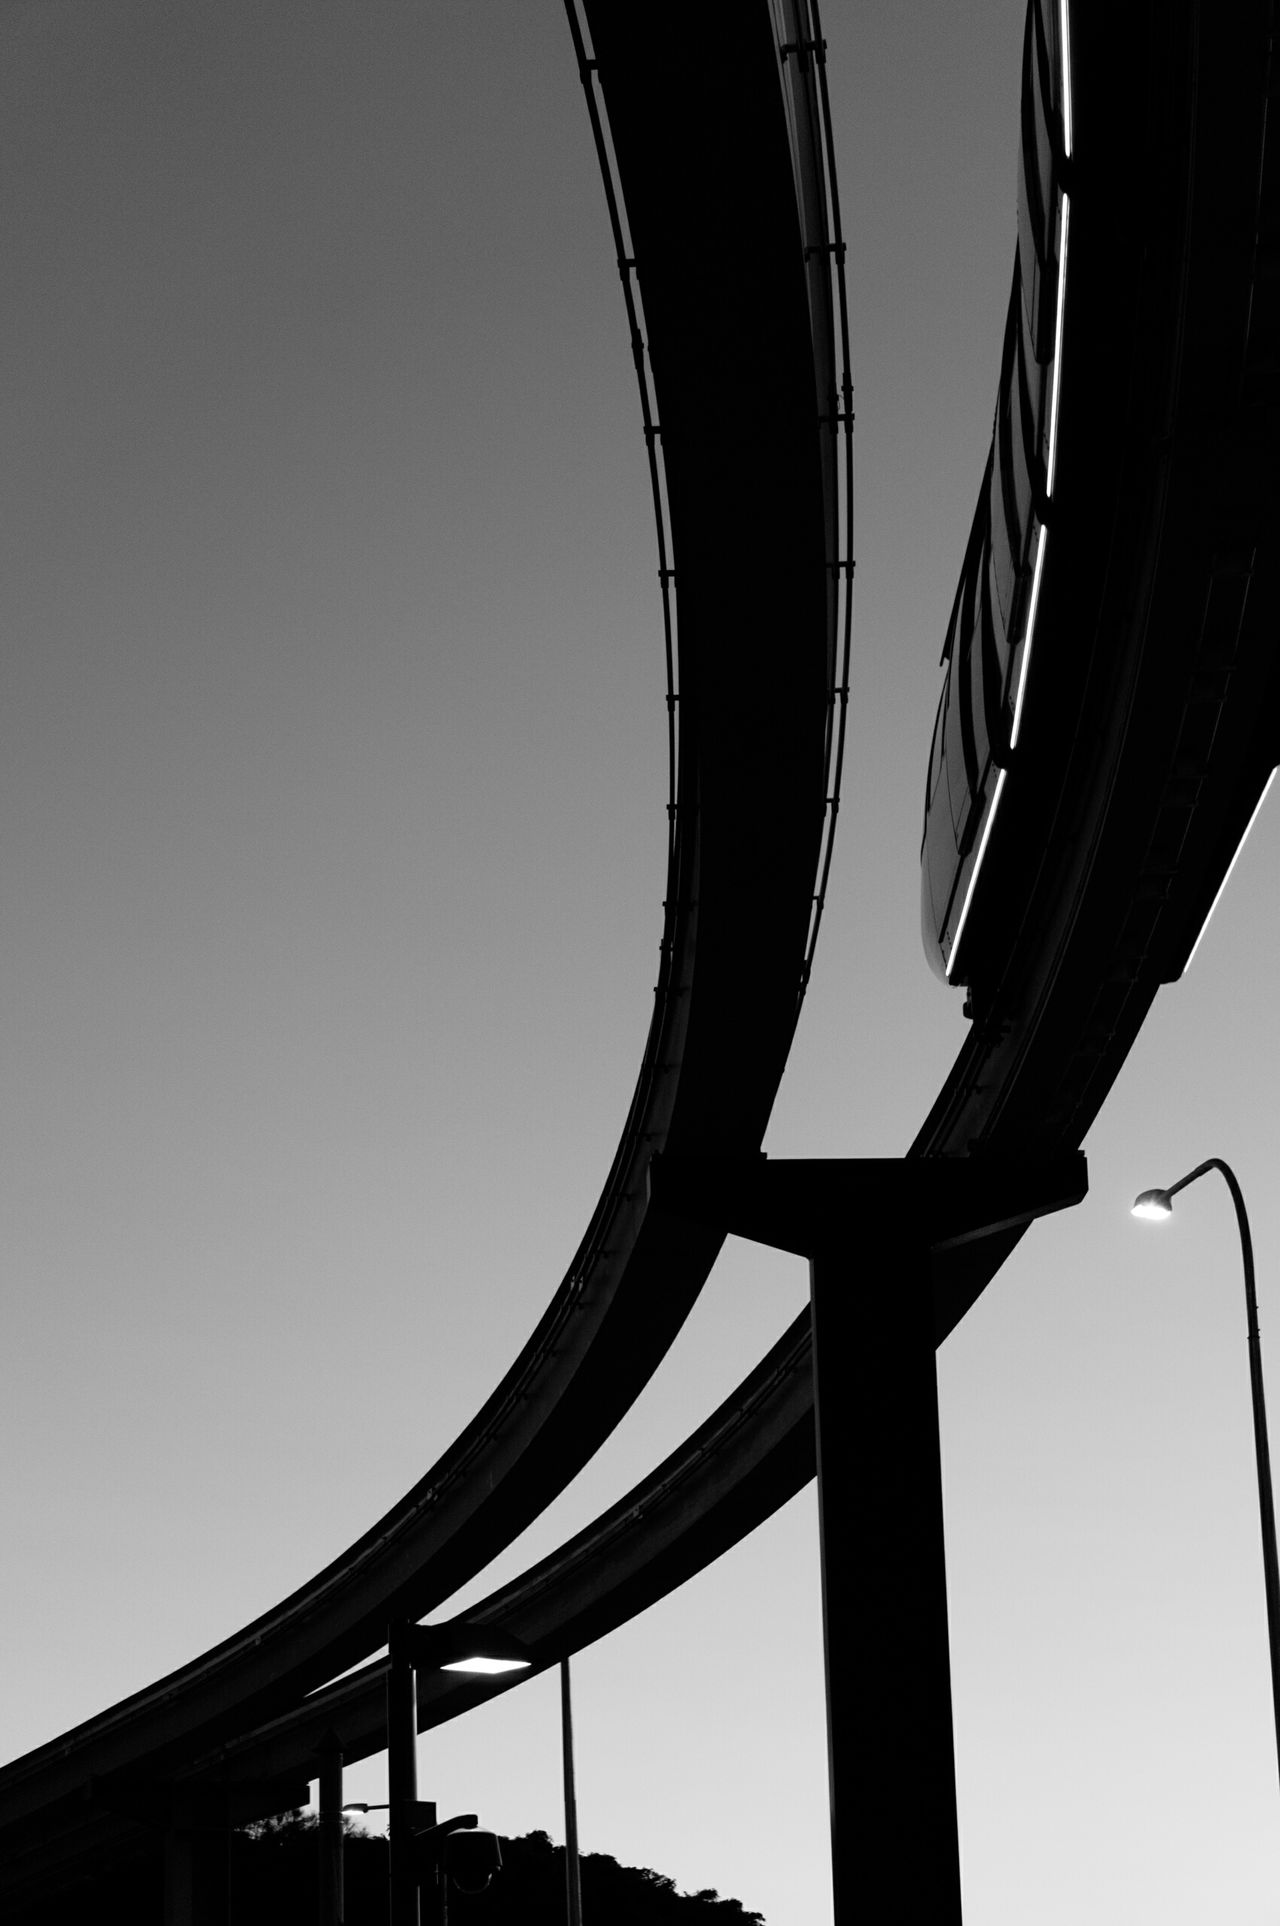 Monorail  Monochrome Blackandwhite Streetphoto_bw Urban Geometry Urban Landscape Silhouette Sunset_collection Architecture_bw The Architect - 2015 EyeEm Awards